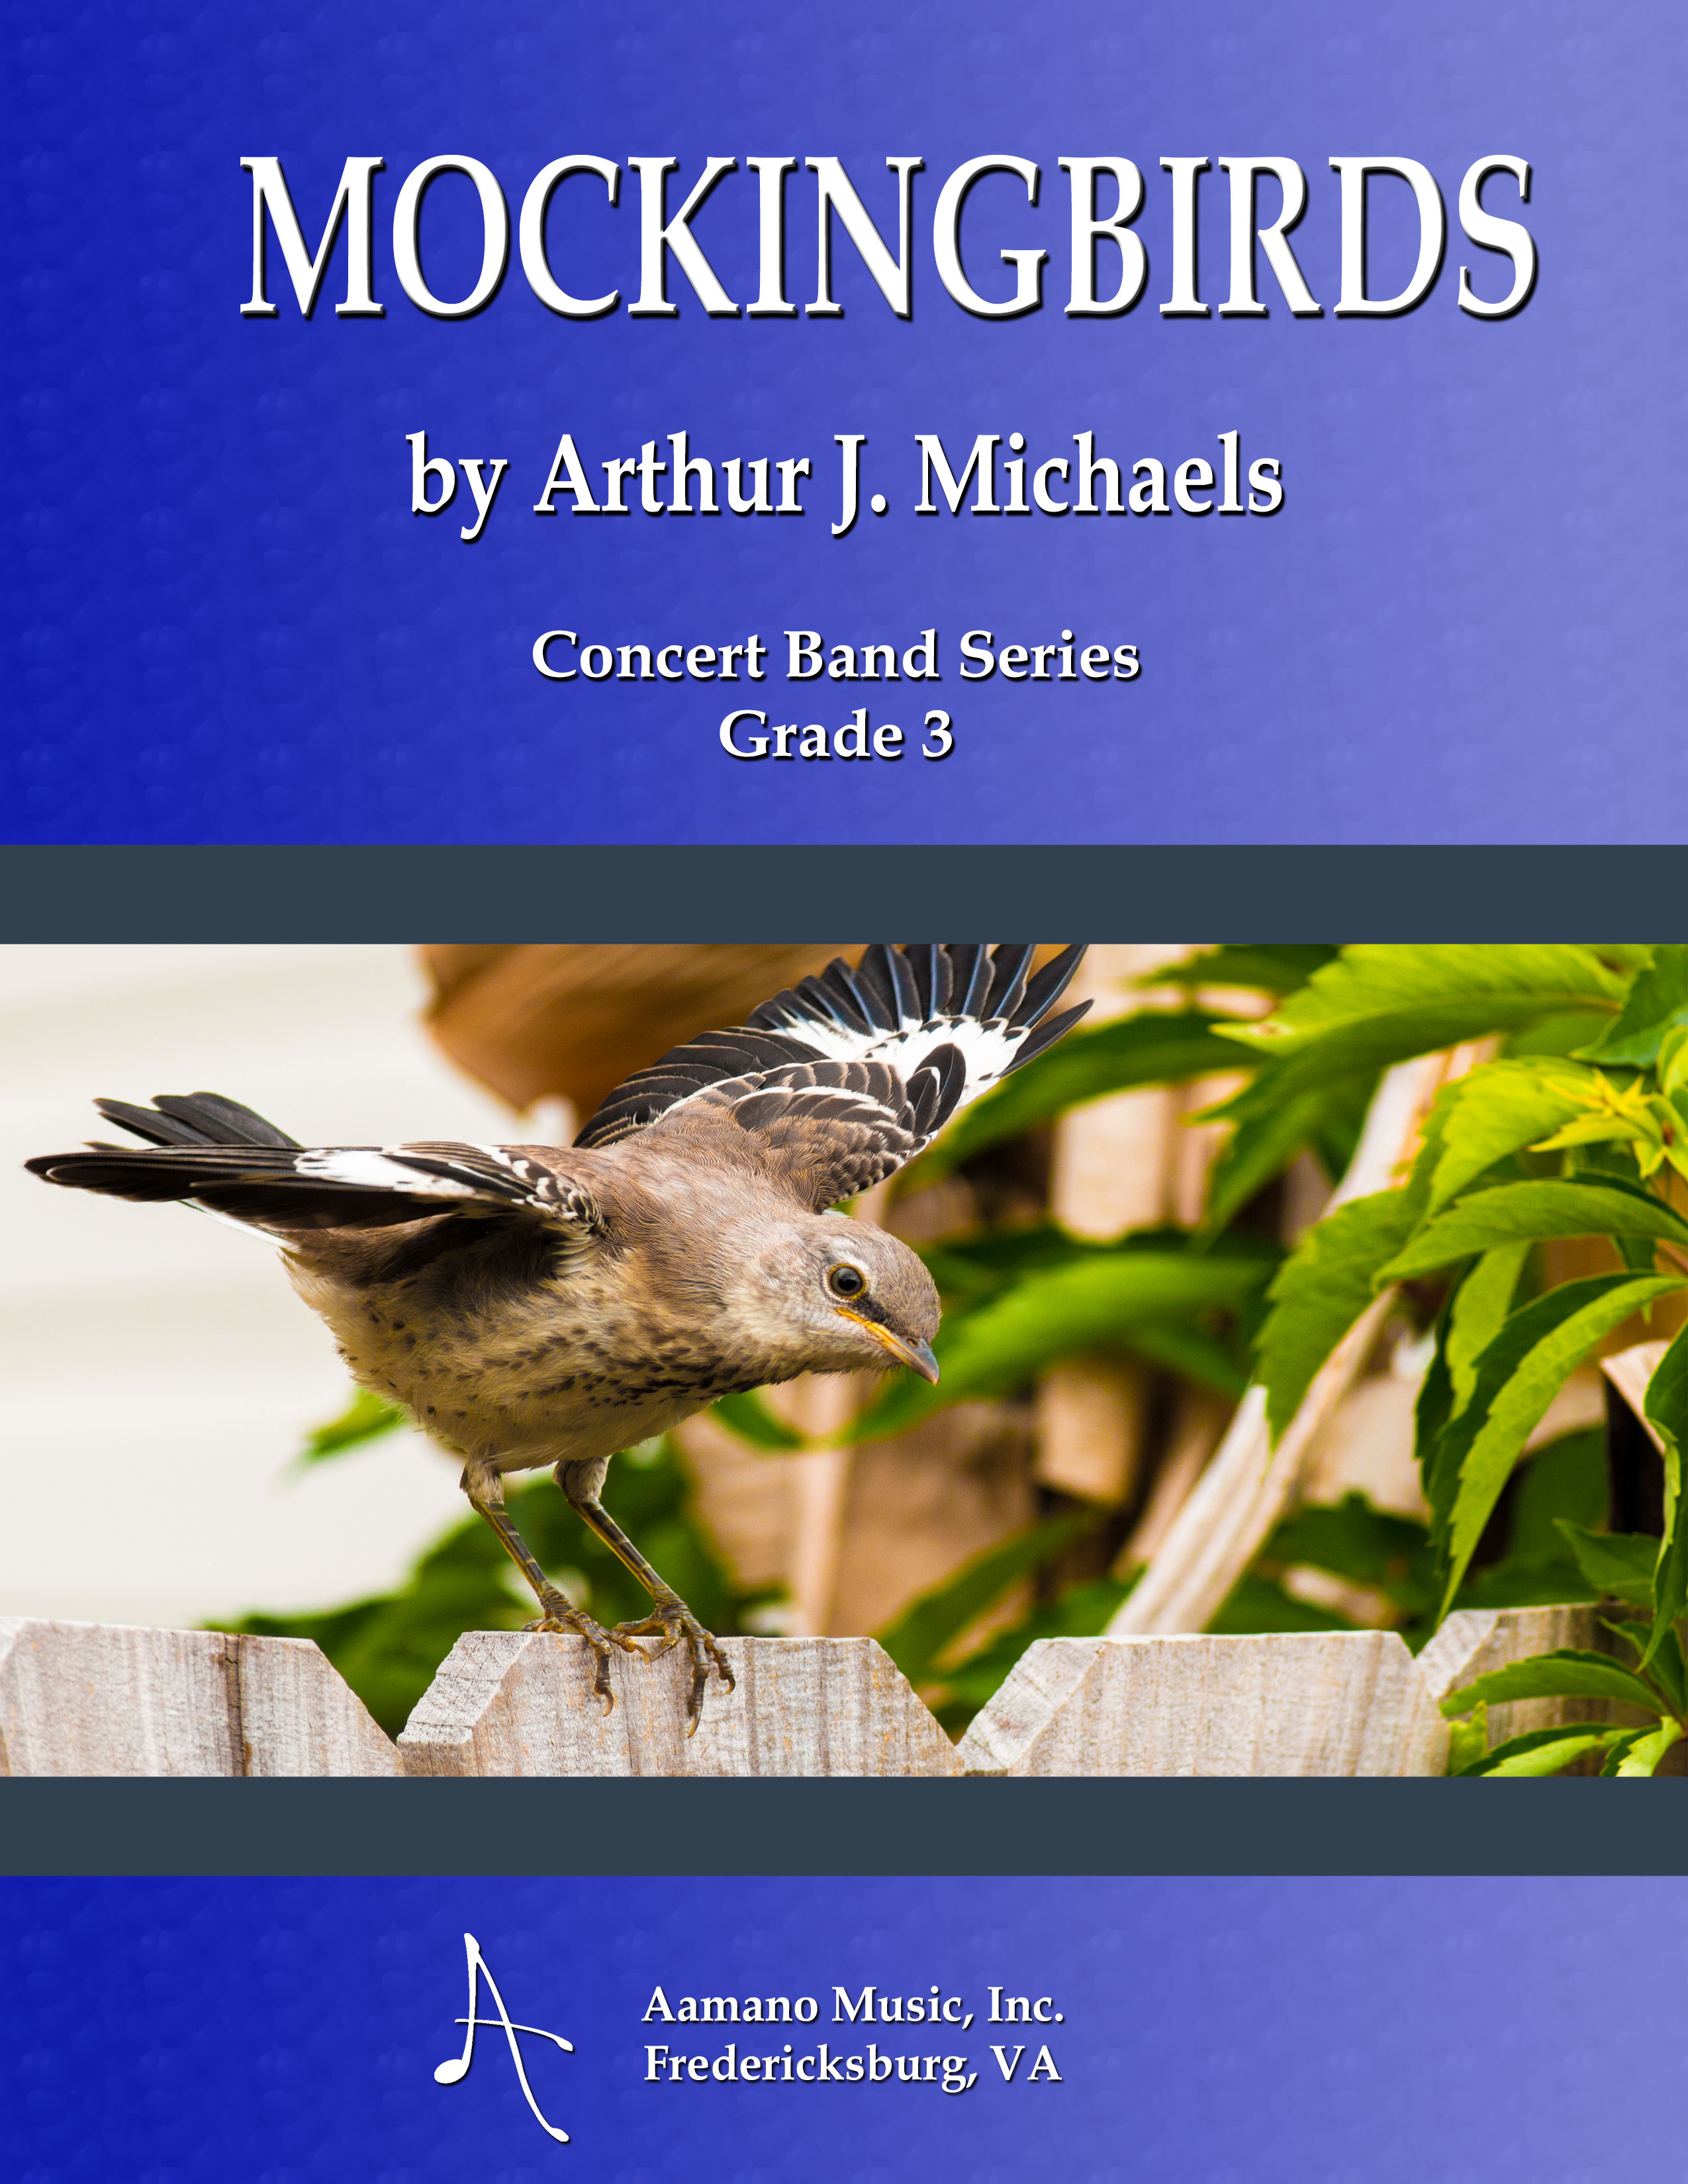 COVER---MOCKINGBIRDS---ARTHUR-MICHAELS---CONCERT-BAND-SERIES